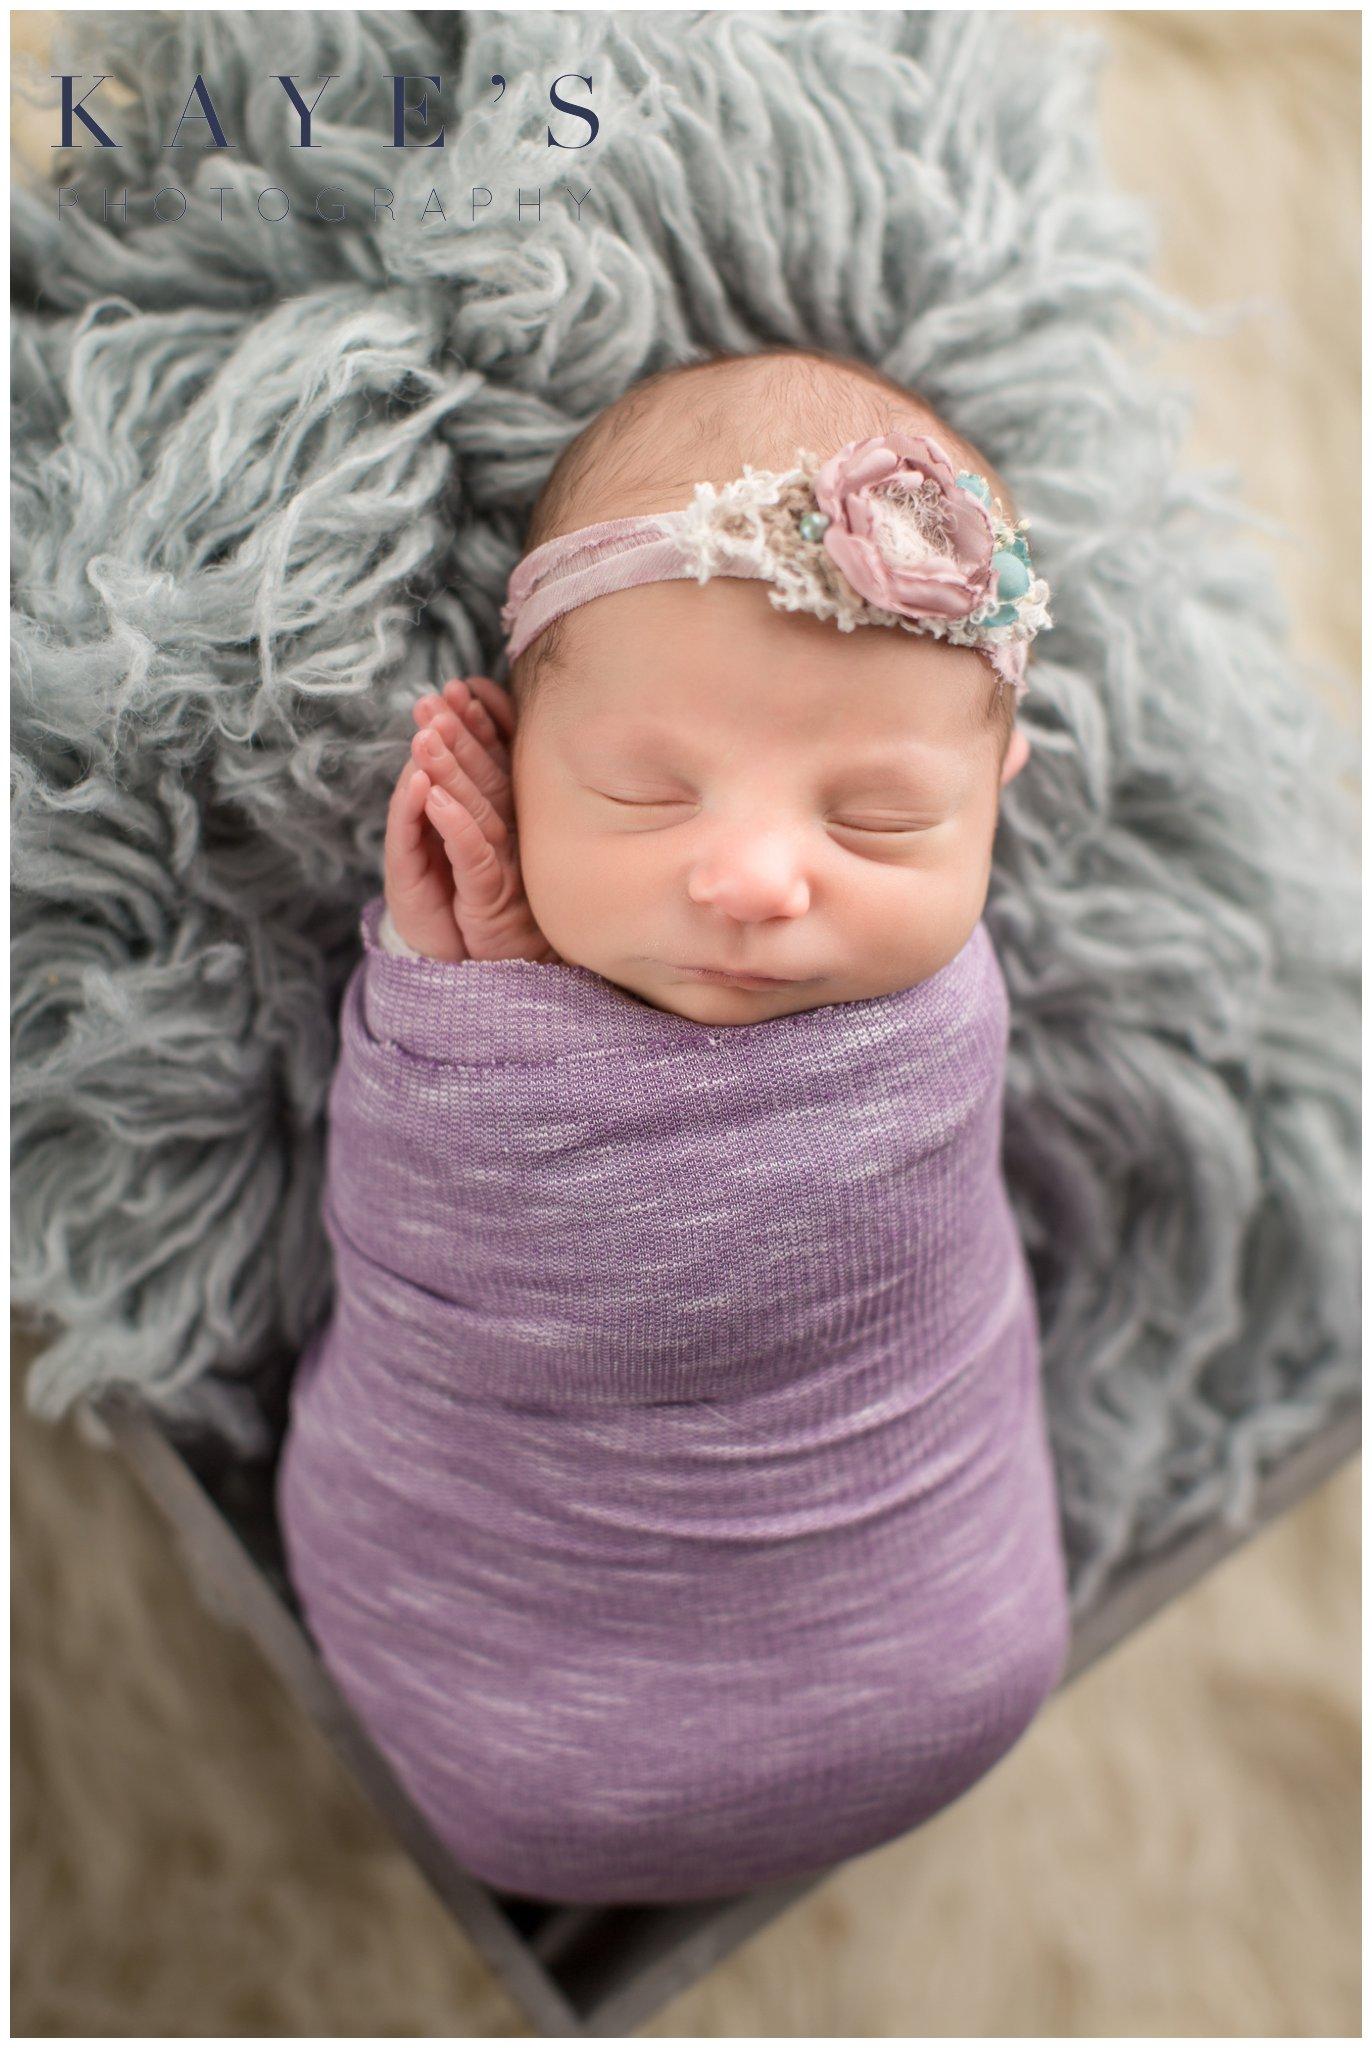 Celebrity newborn portraits of baby girl wearing purple wrap in basket with a headband